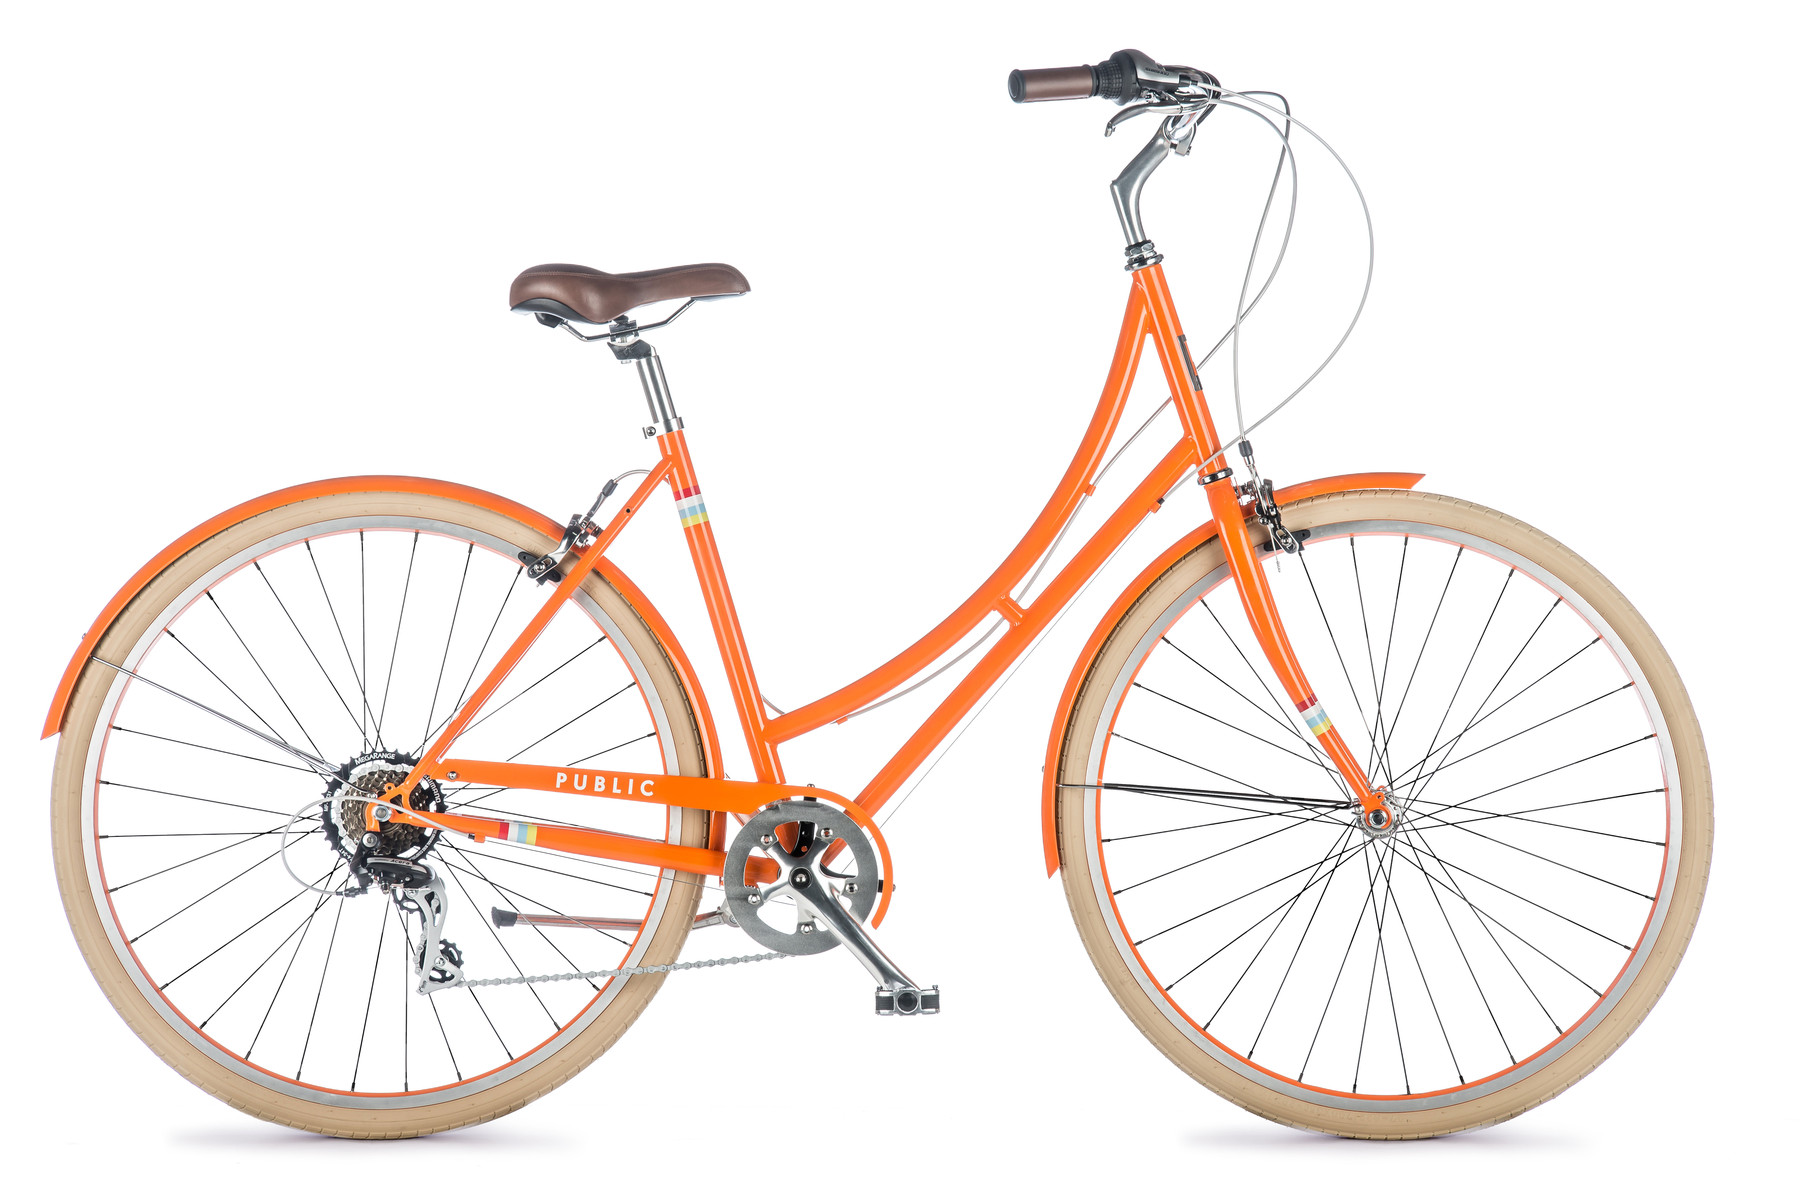 Public Bikes C7 - mikesbikes.com